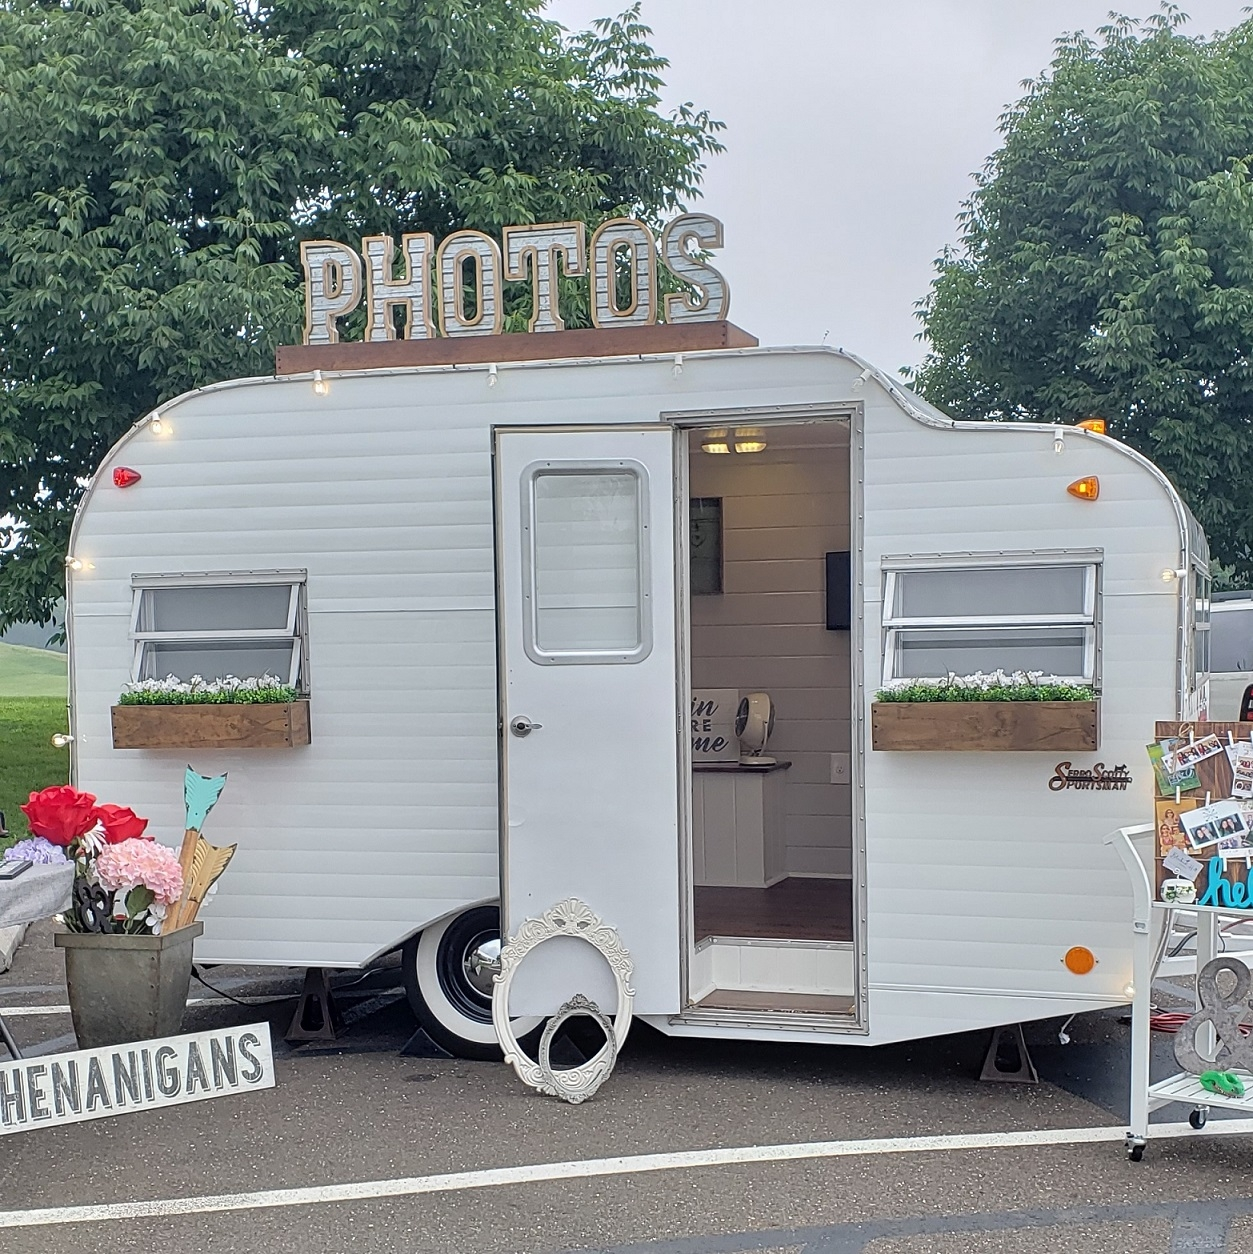 Photo Booth Makefield Setup.jpg